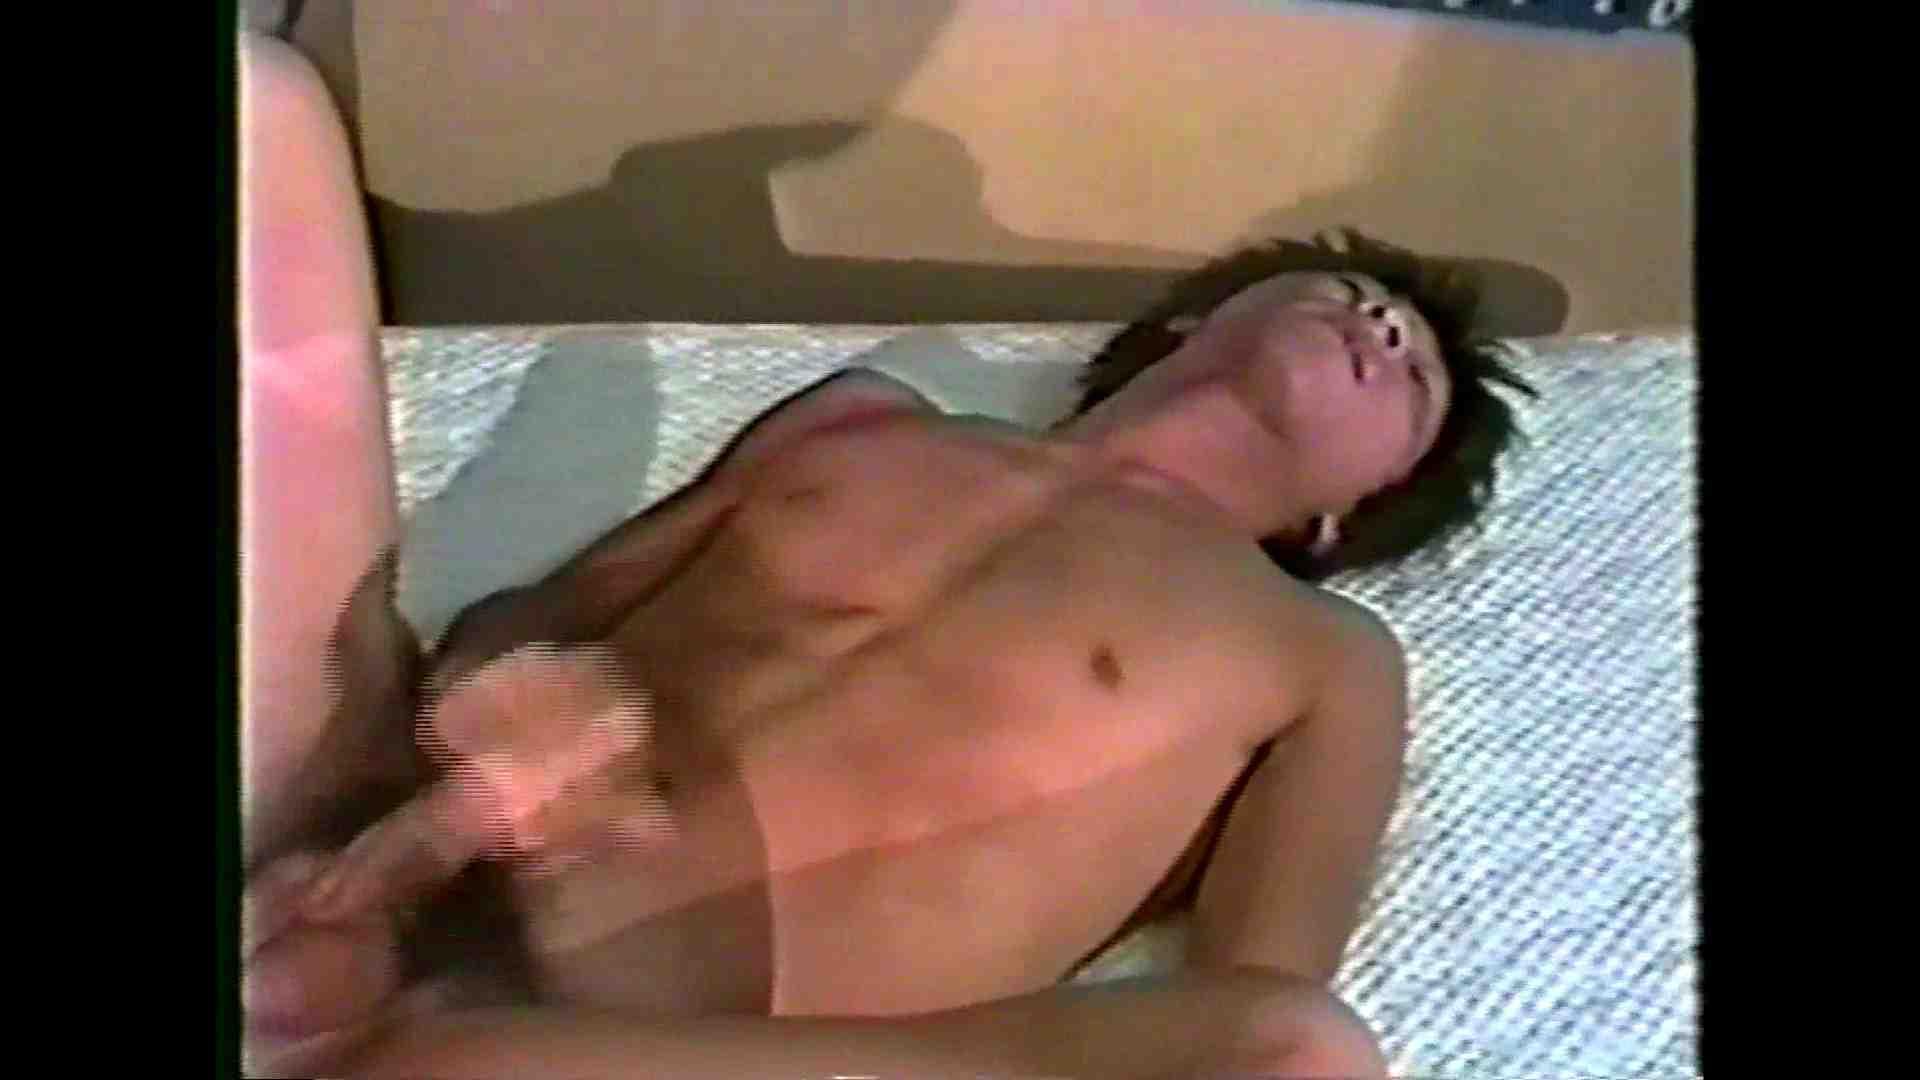 GAYBOY宏のオカズ倉庫Vol.3-4 オナニー アダルトビデオ画像キャプチャ 91pic 50